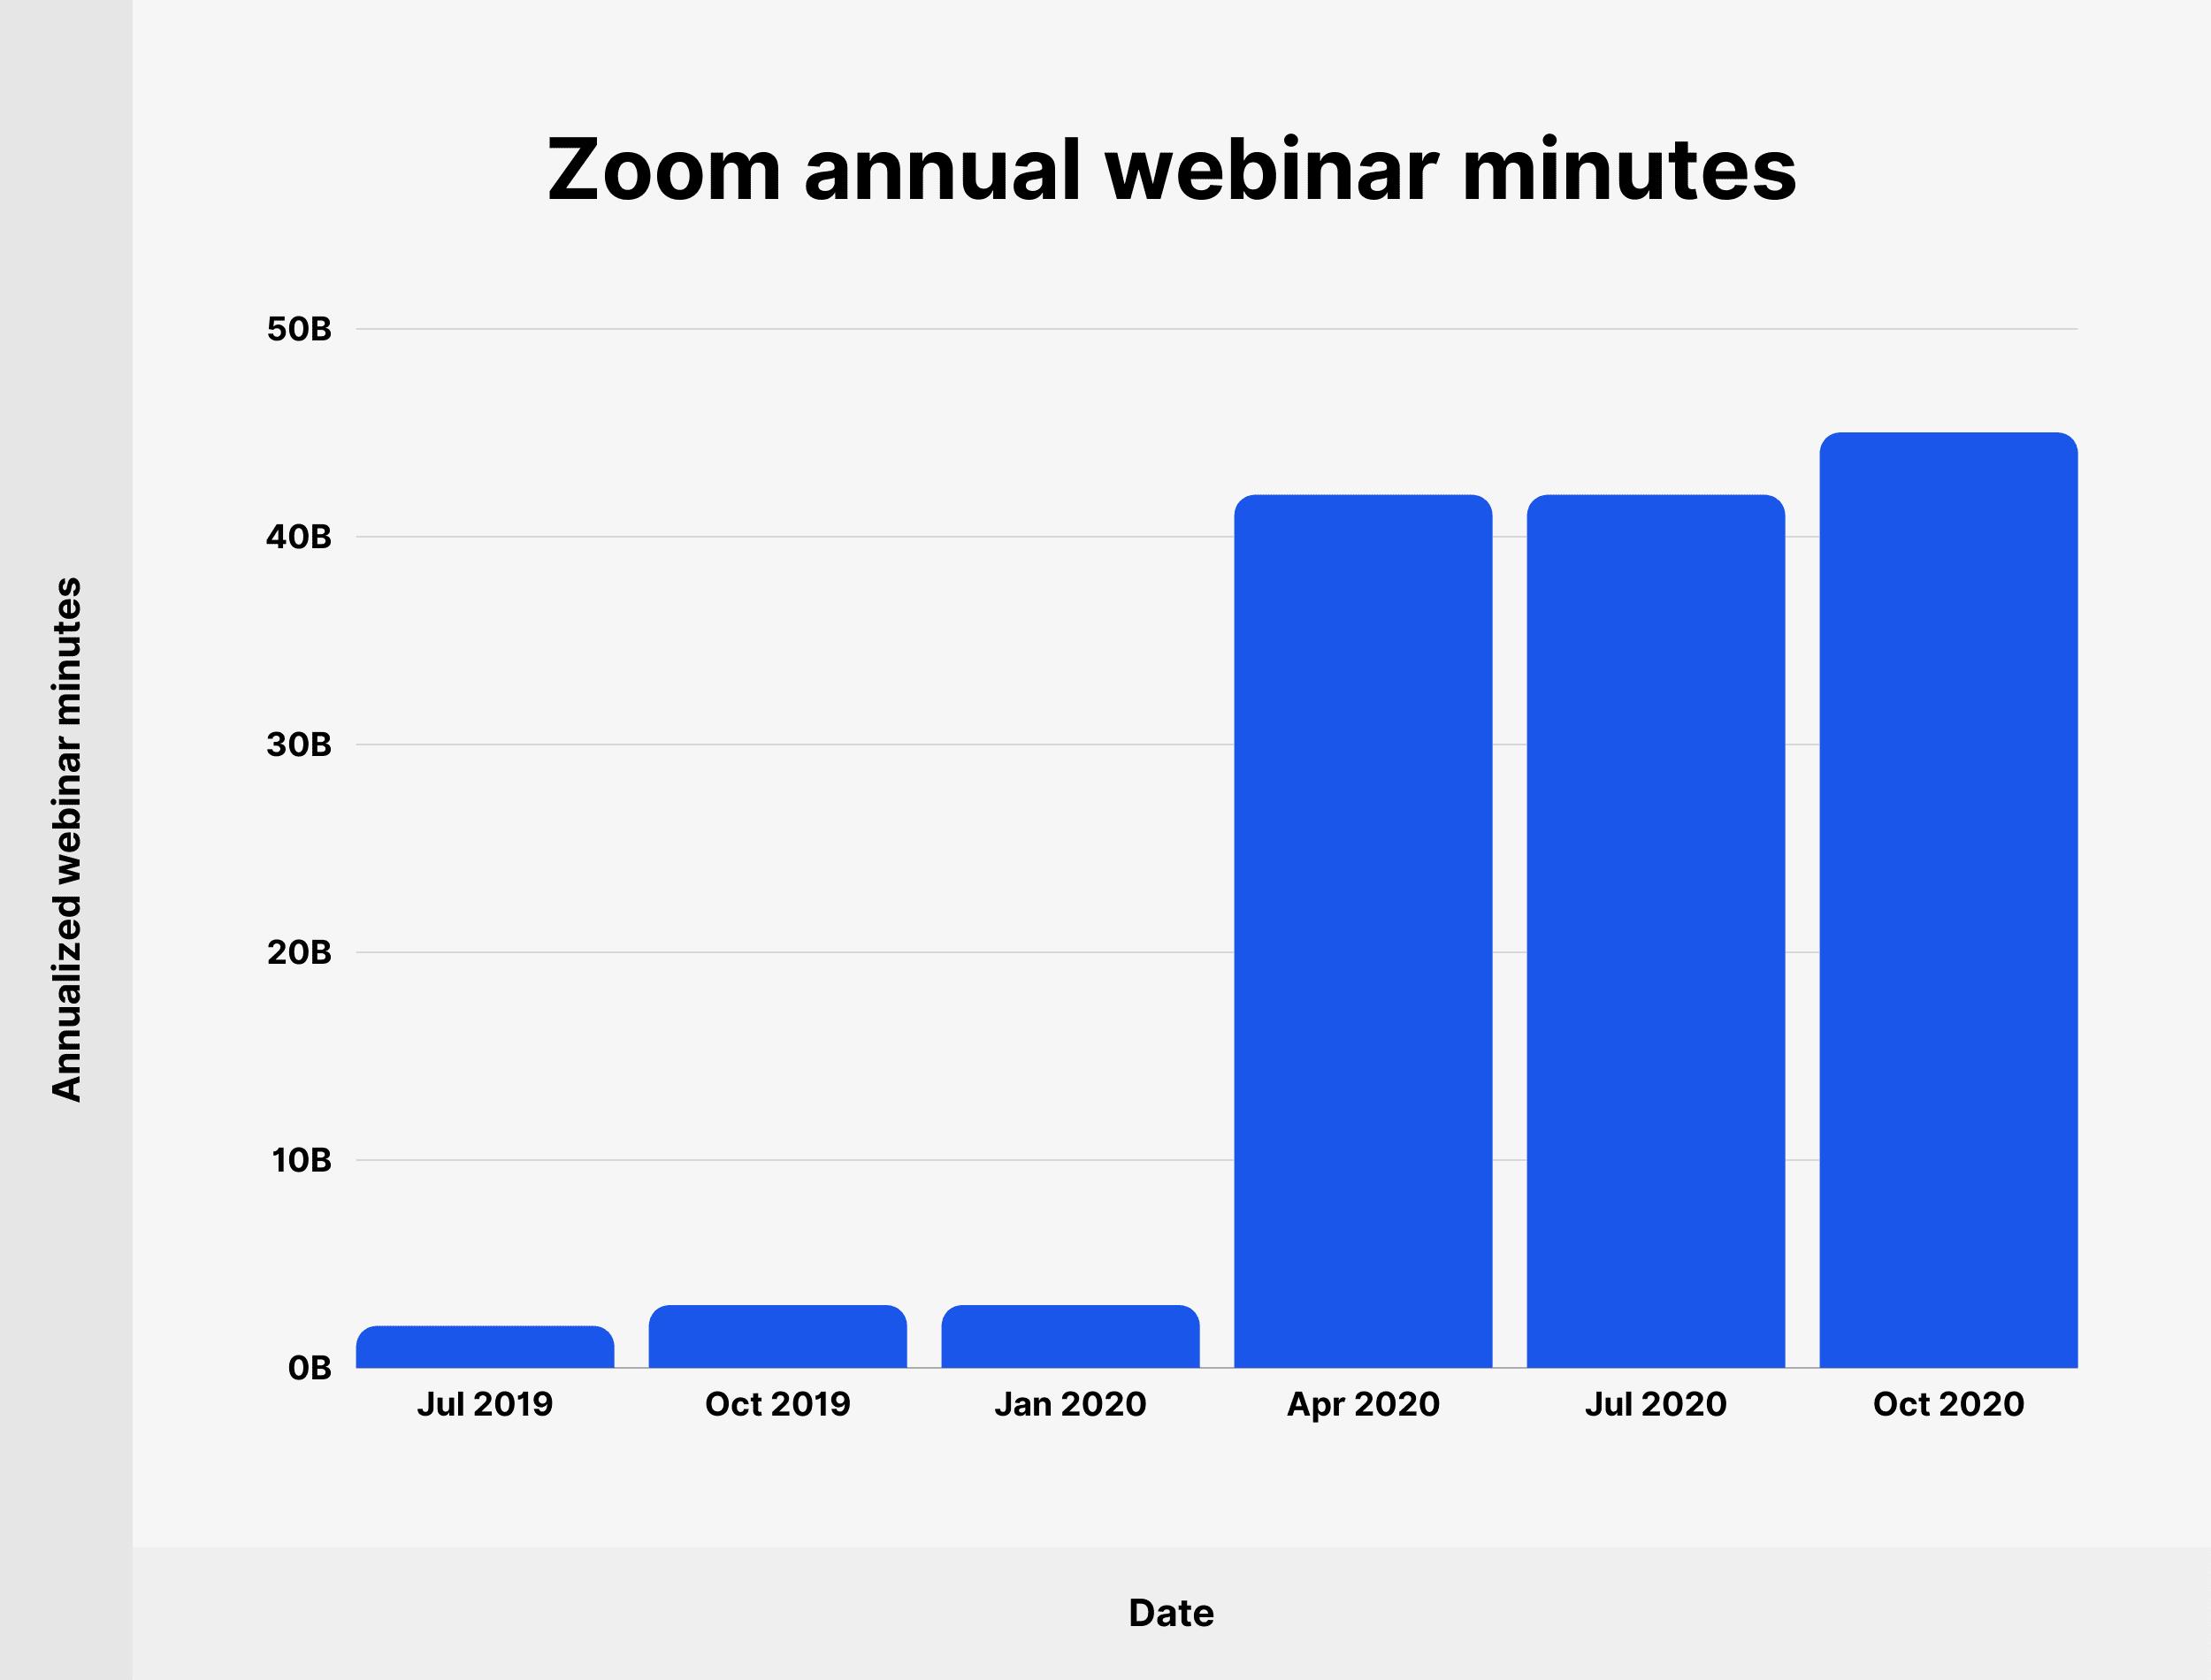 Zoom annual webinar minutes